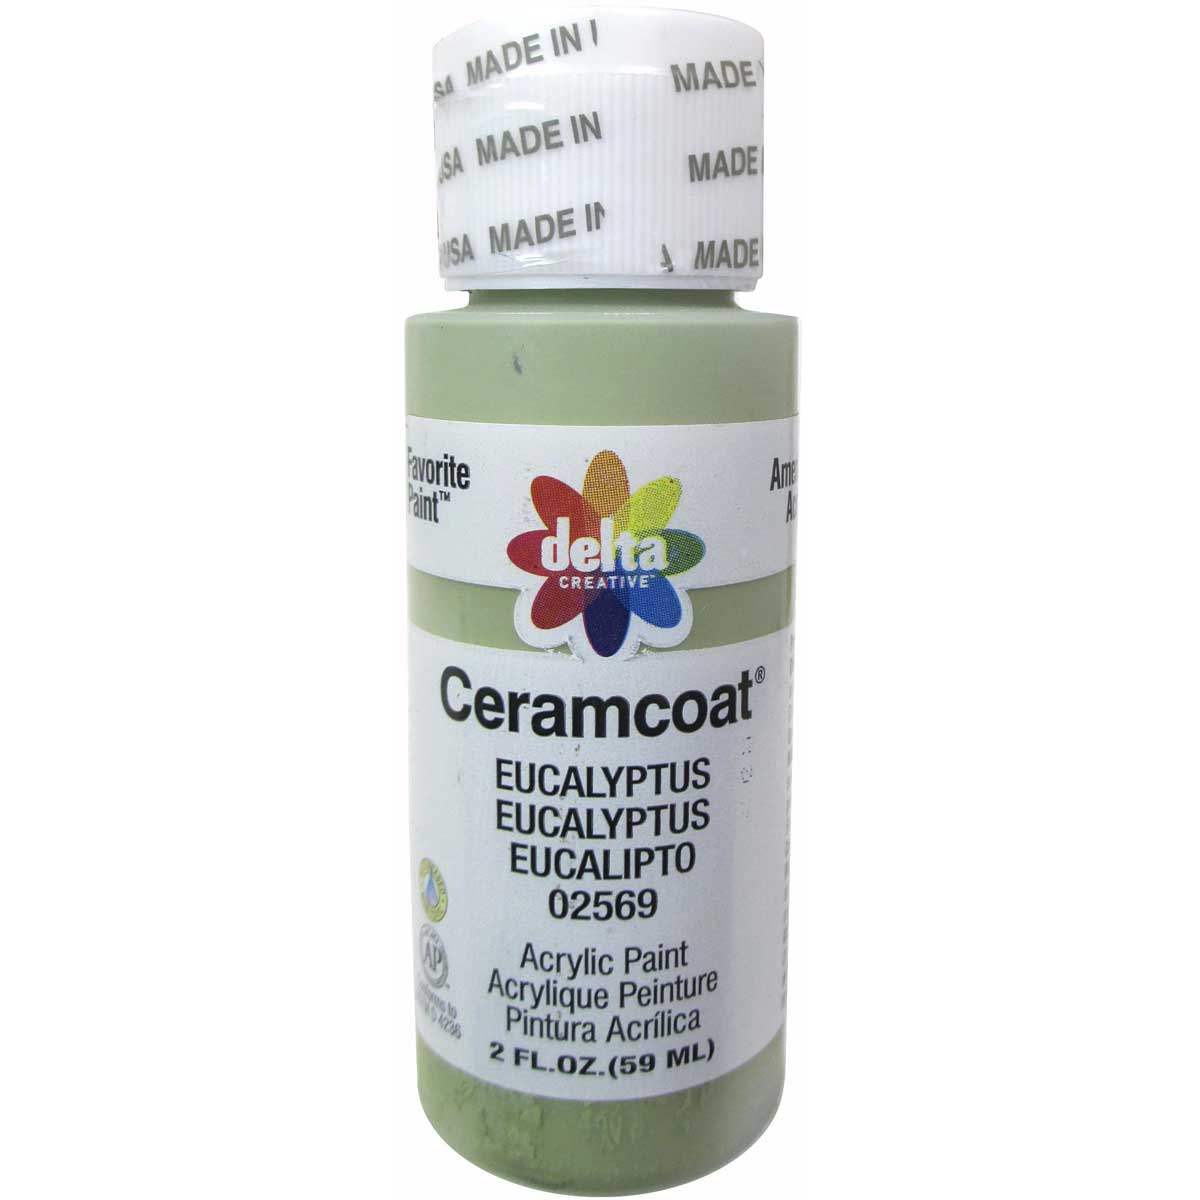 Delta Ceramcoat ® Acrylic Paint - Eucalyptus, 2 oz.